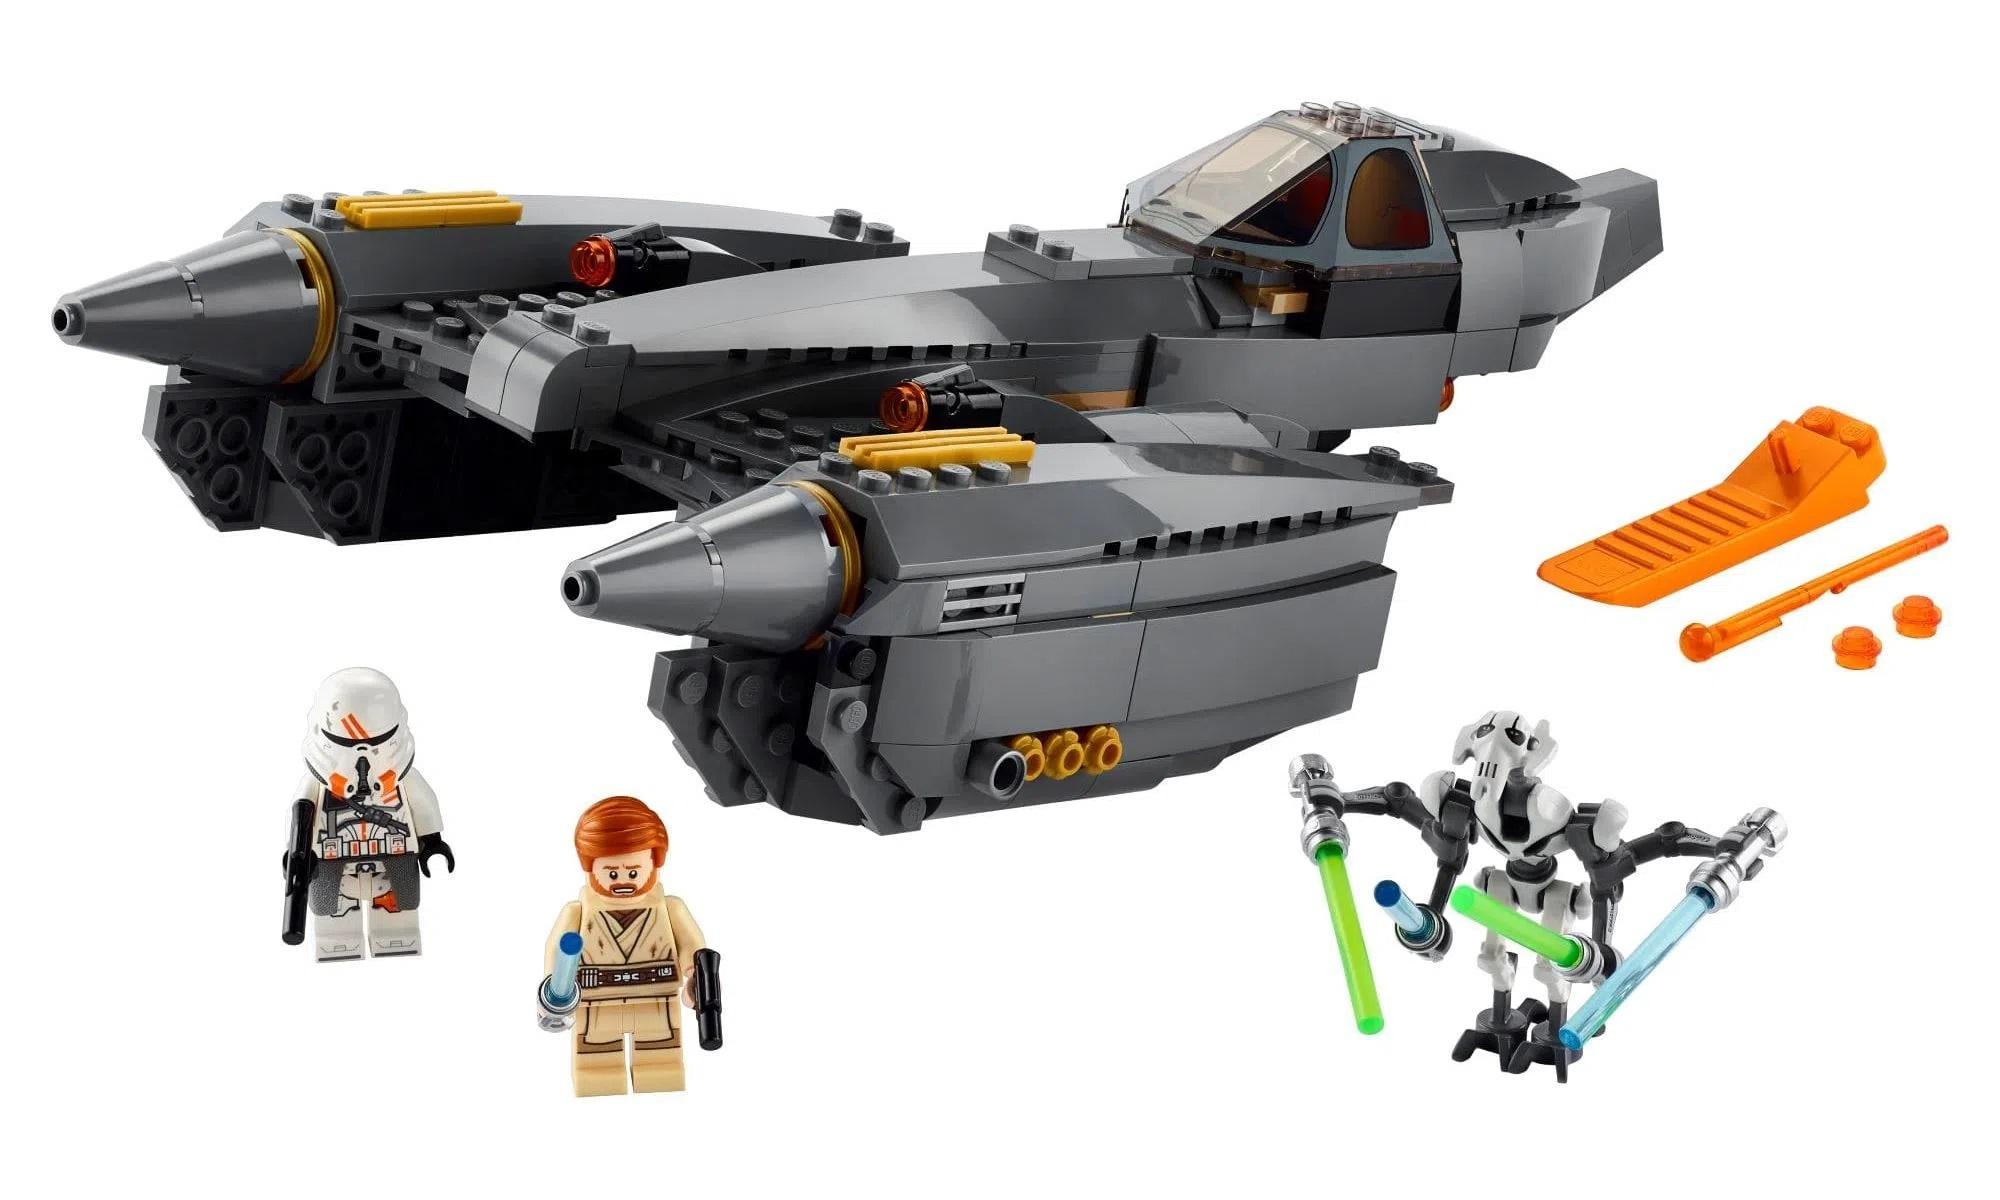 LEGO Star Wars Starfighter do General Grievous 75286